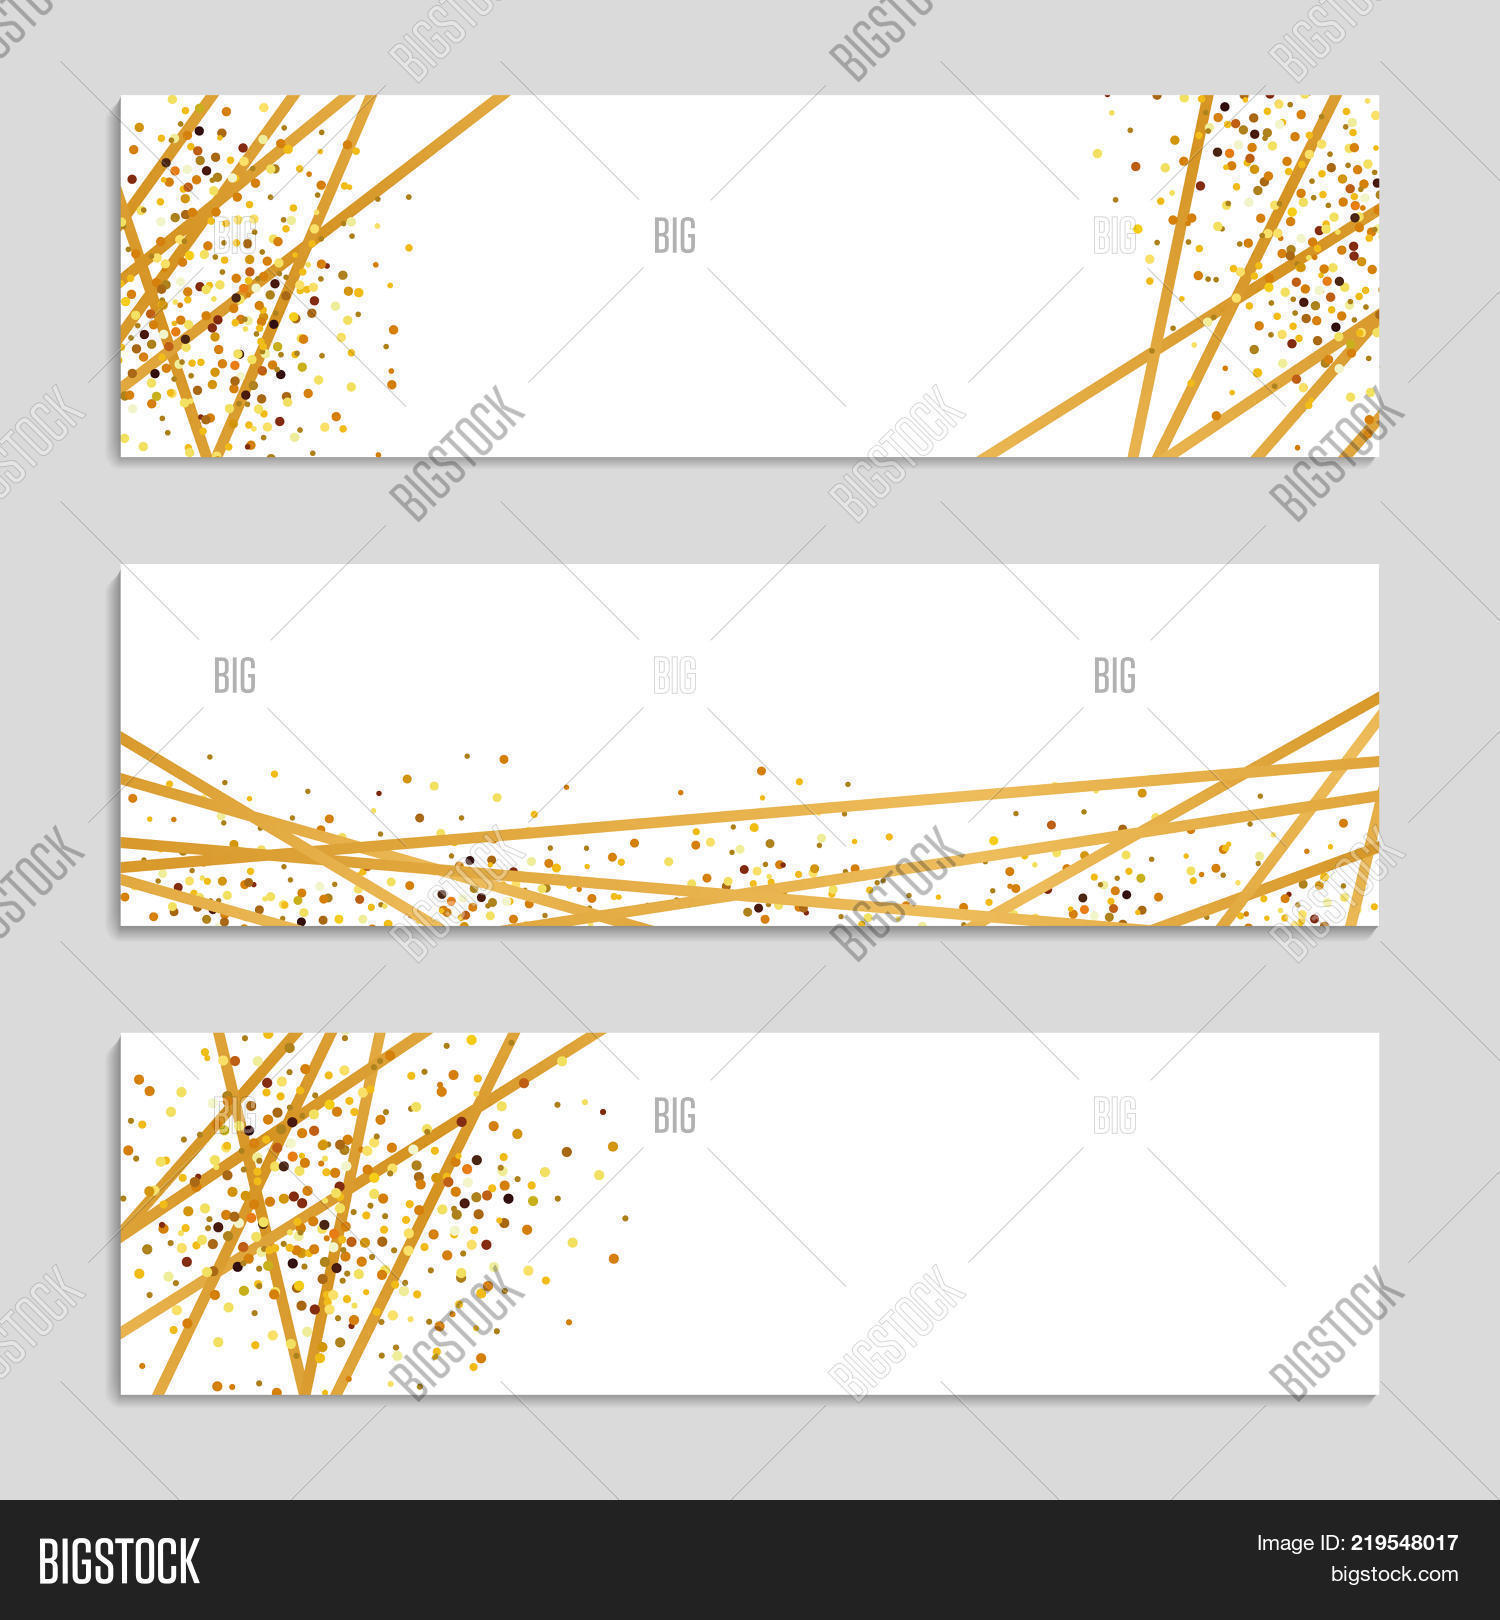 gold sparkles banner background streamer background golden ribbon sparkling glitter christmas holidays background